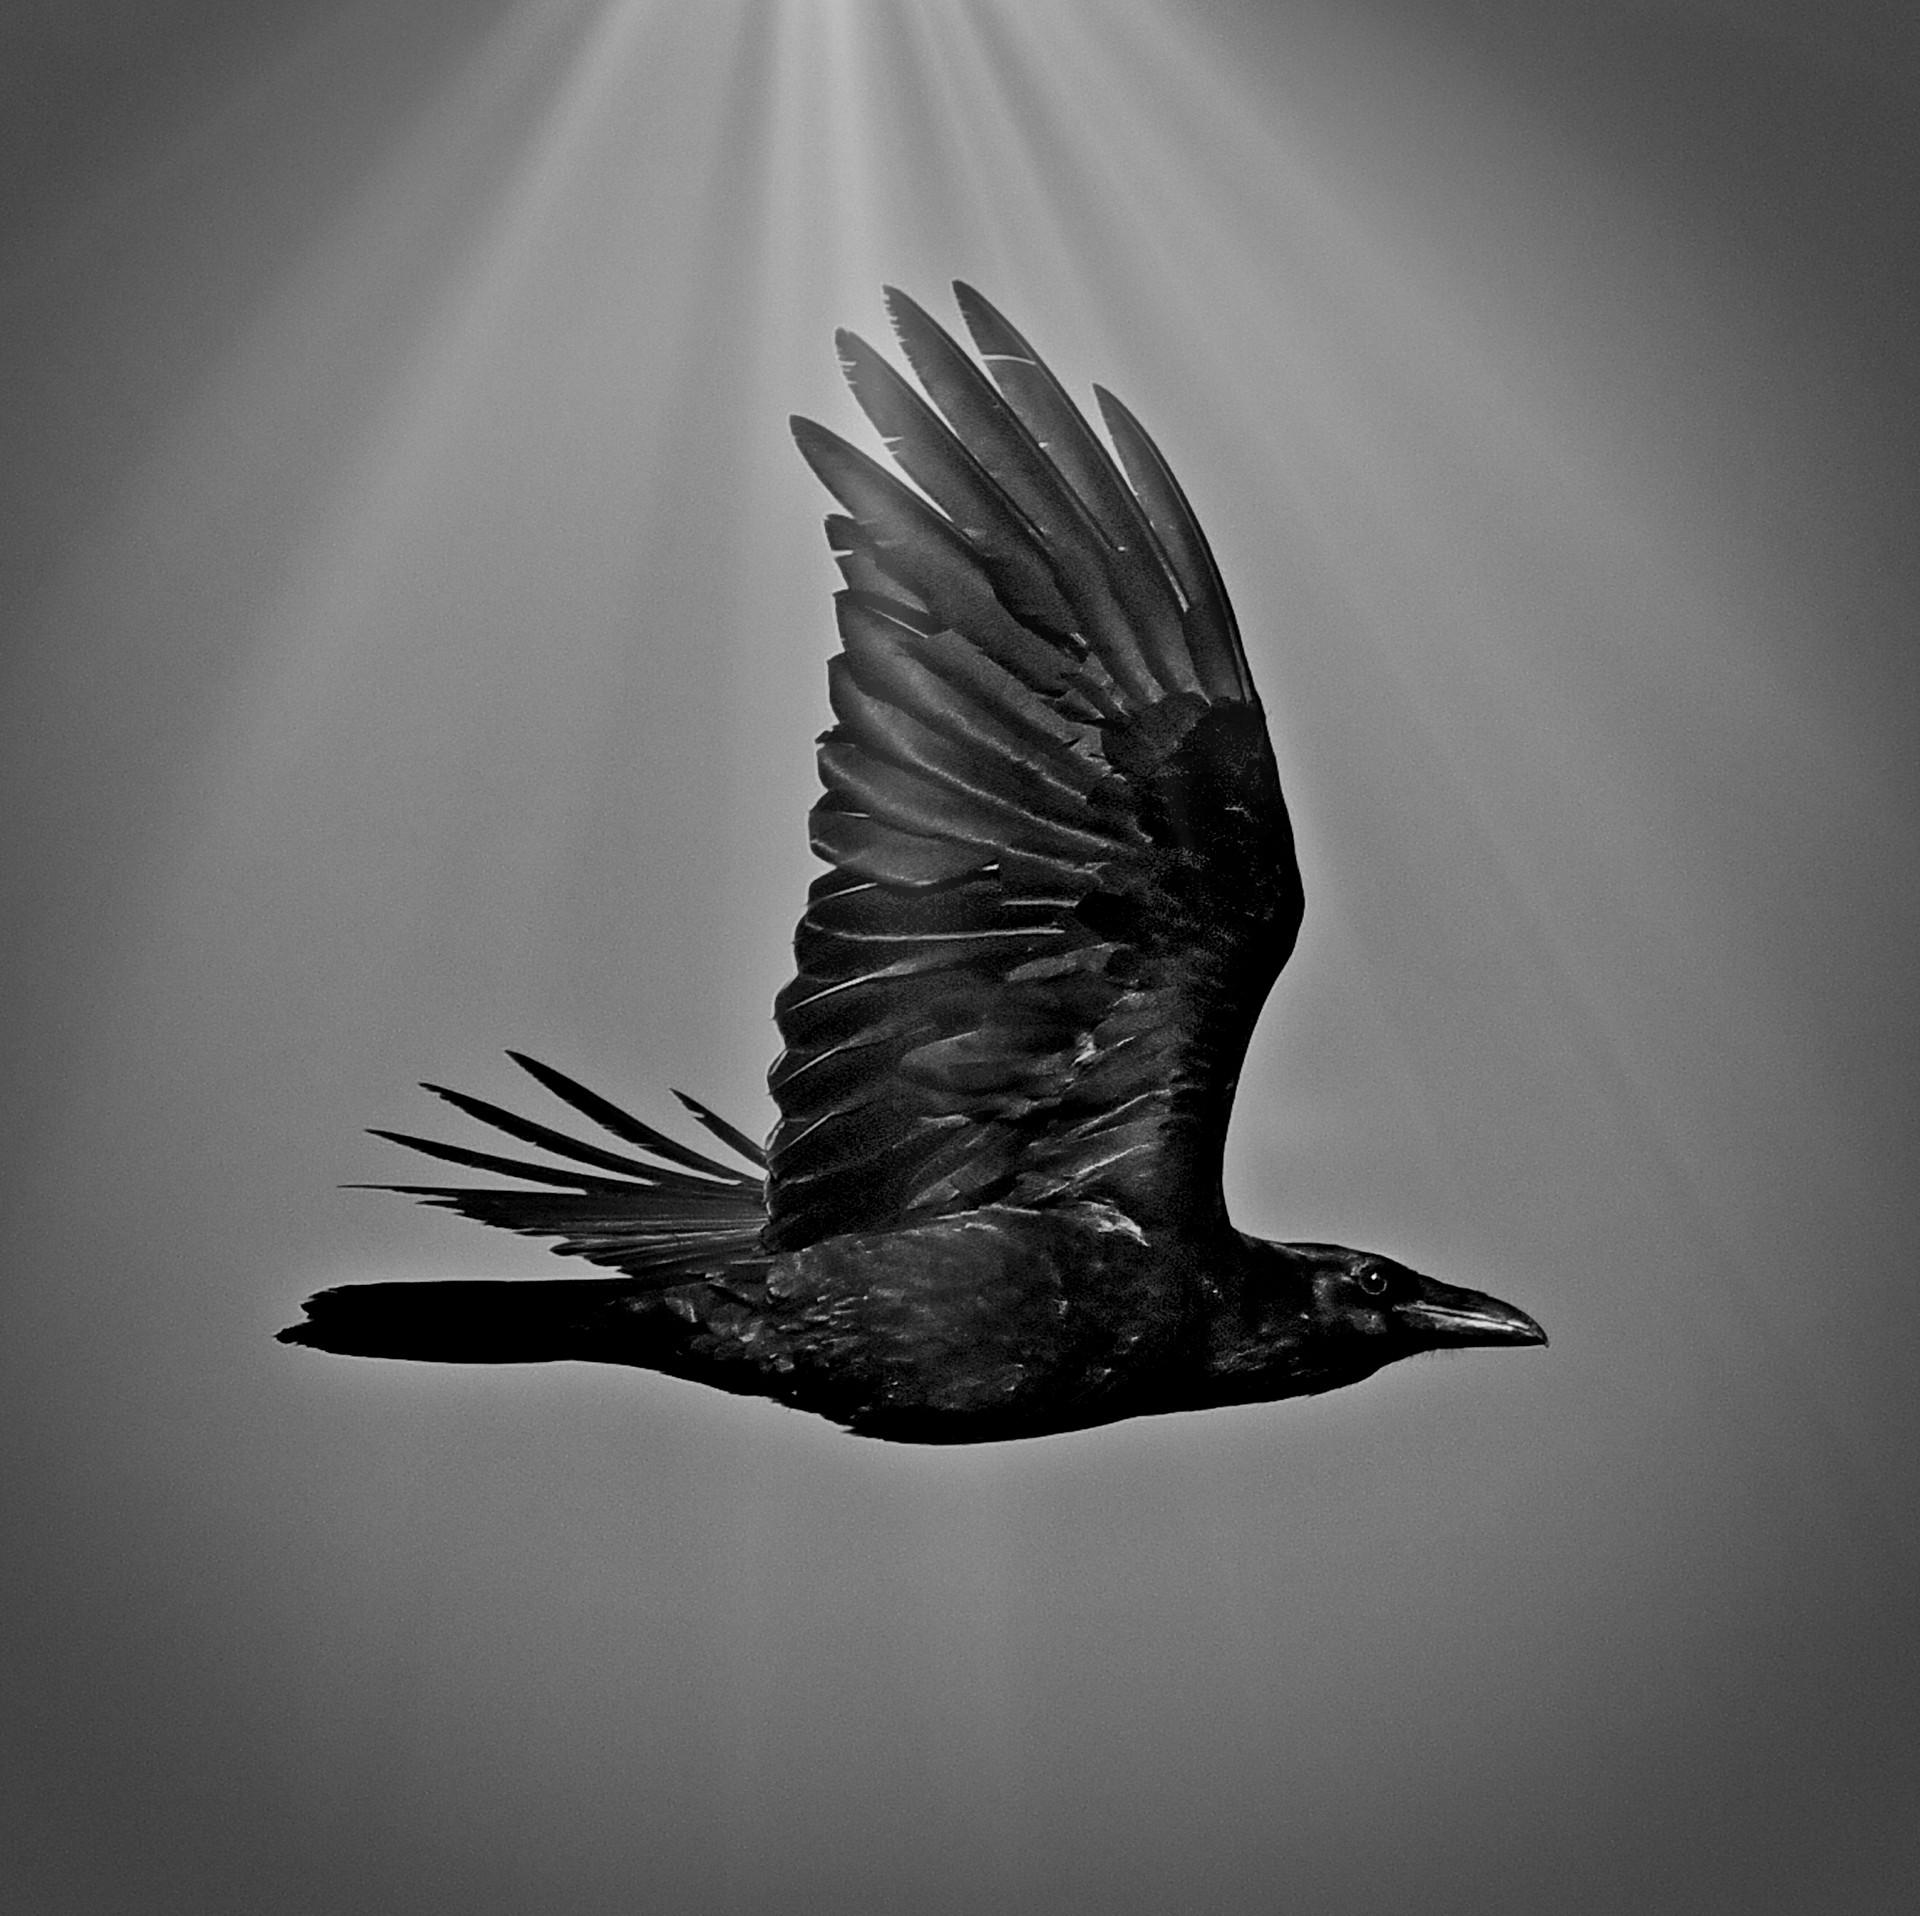 RavenDay